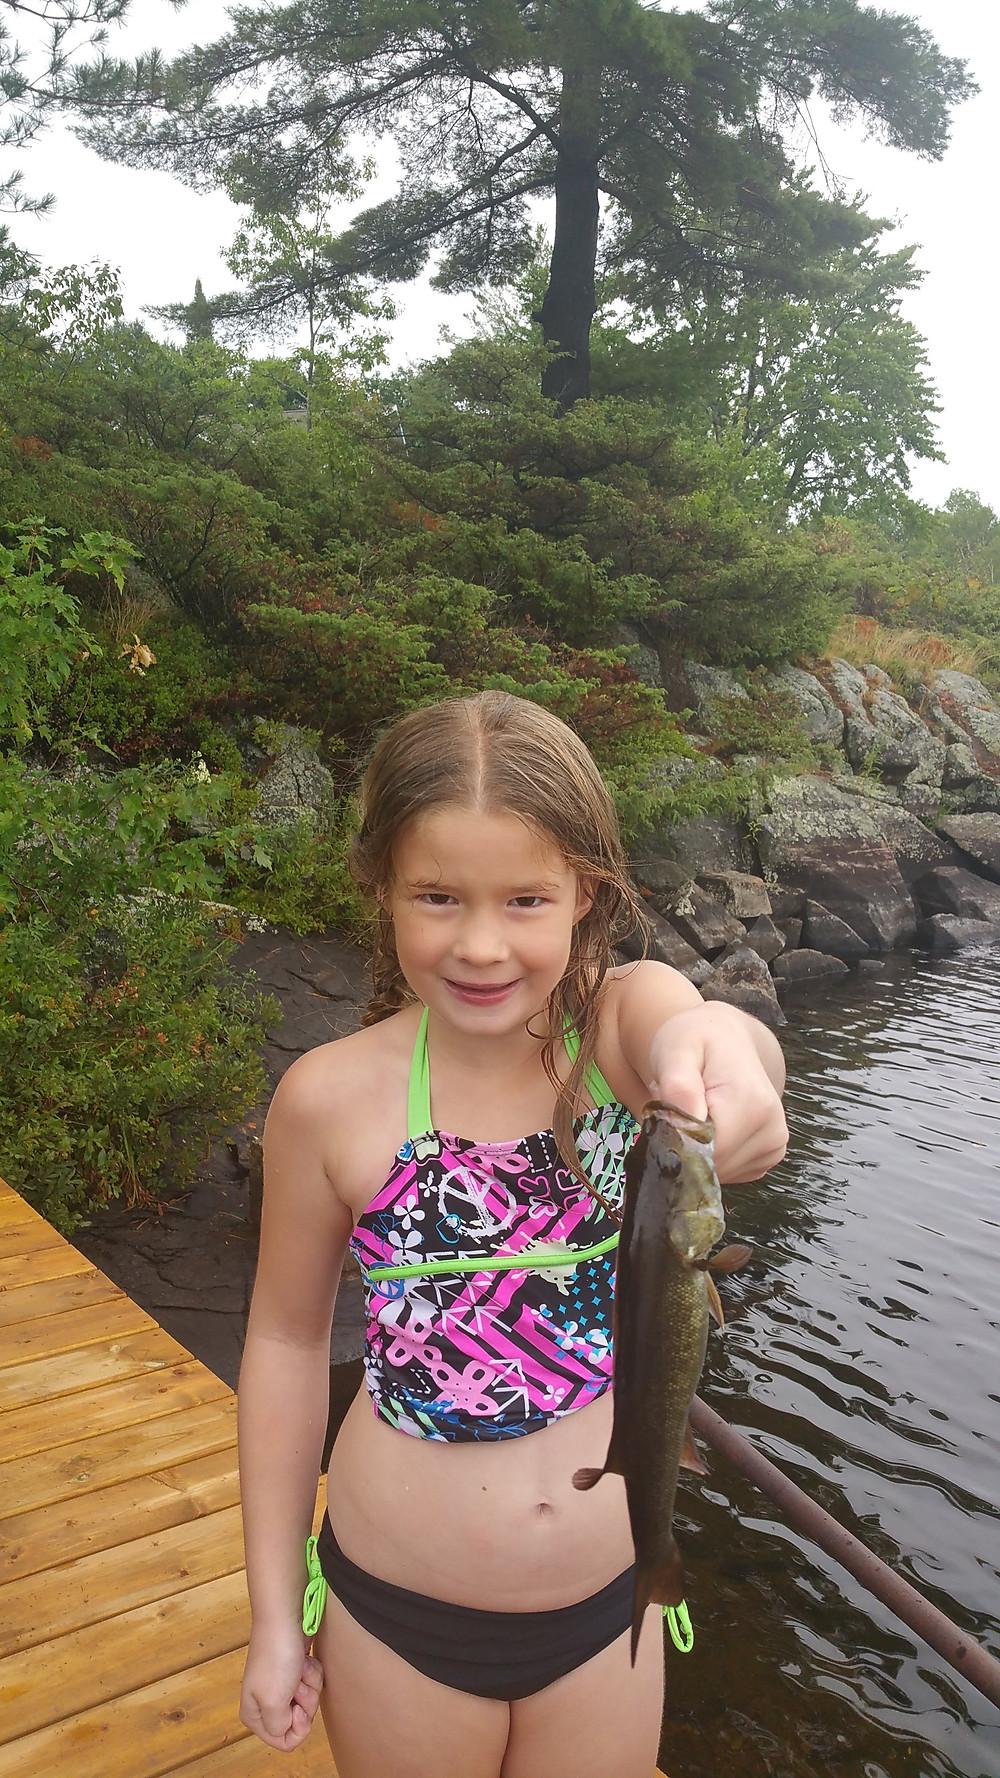 Girl qith a nice bass caught in Muskoka, Ontario